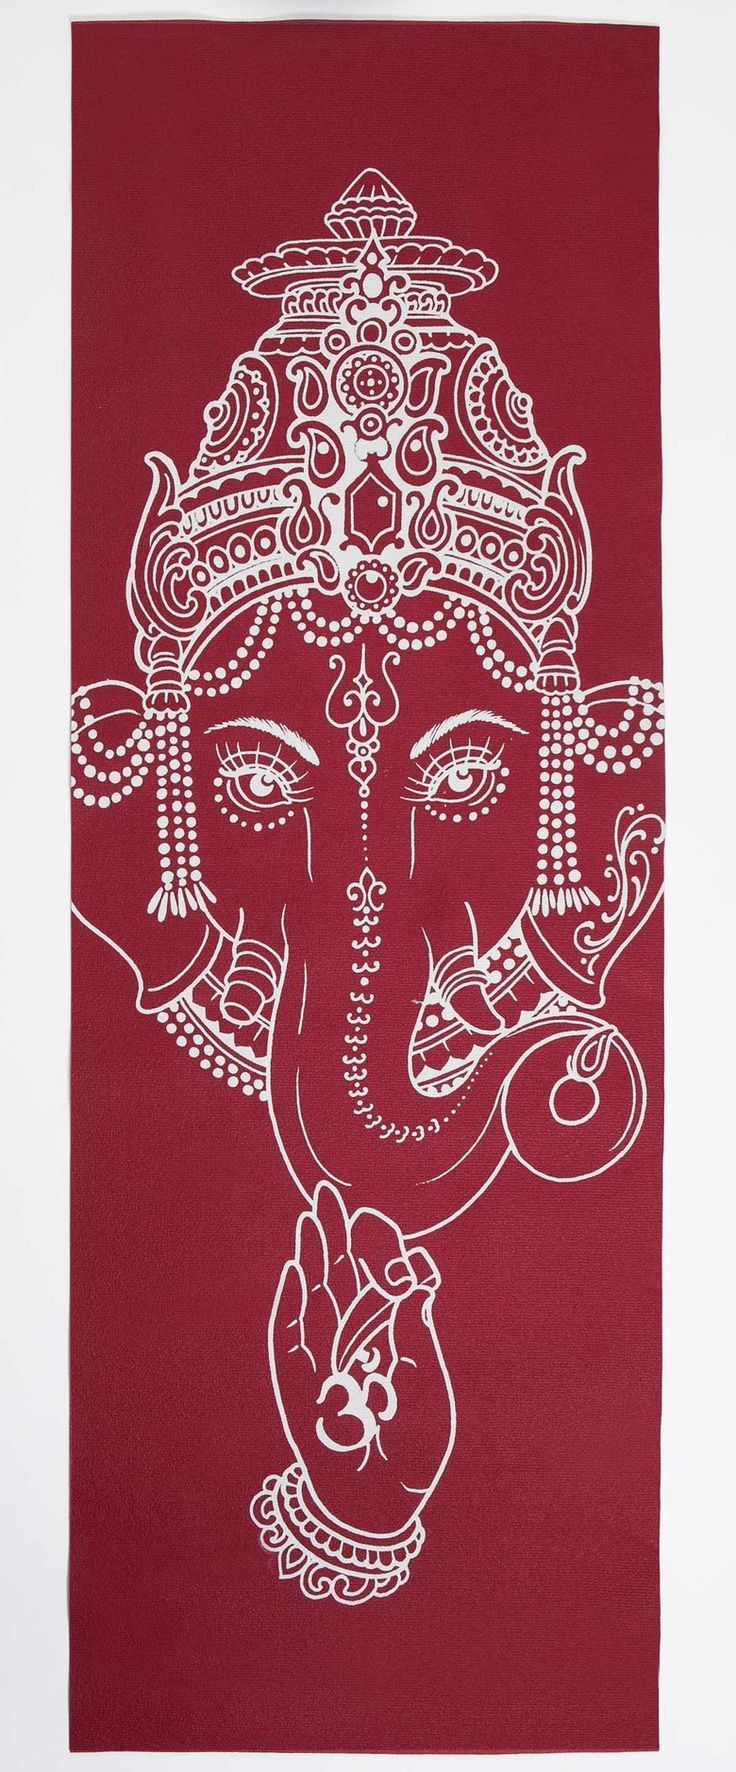 Image of Ganesh bordeaux